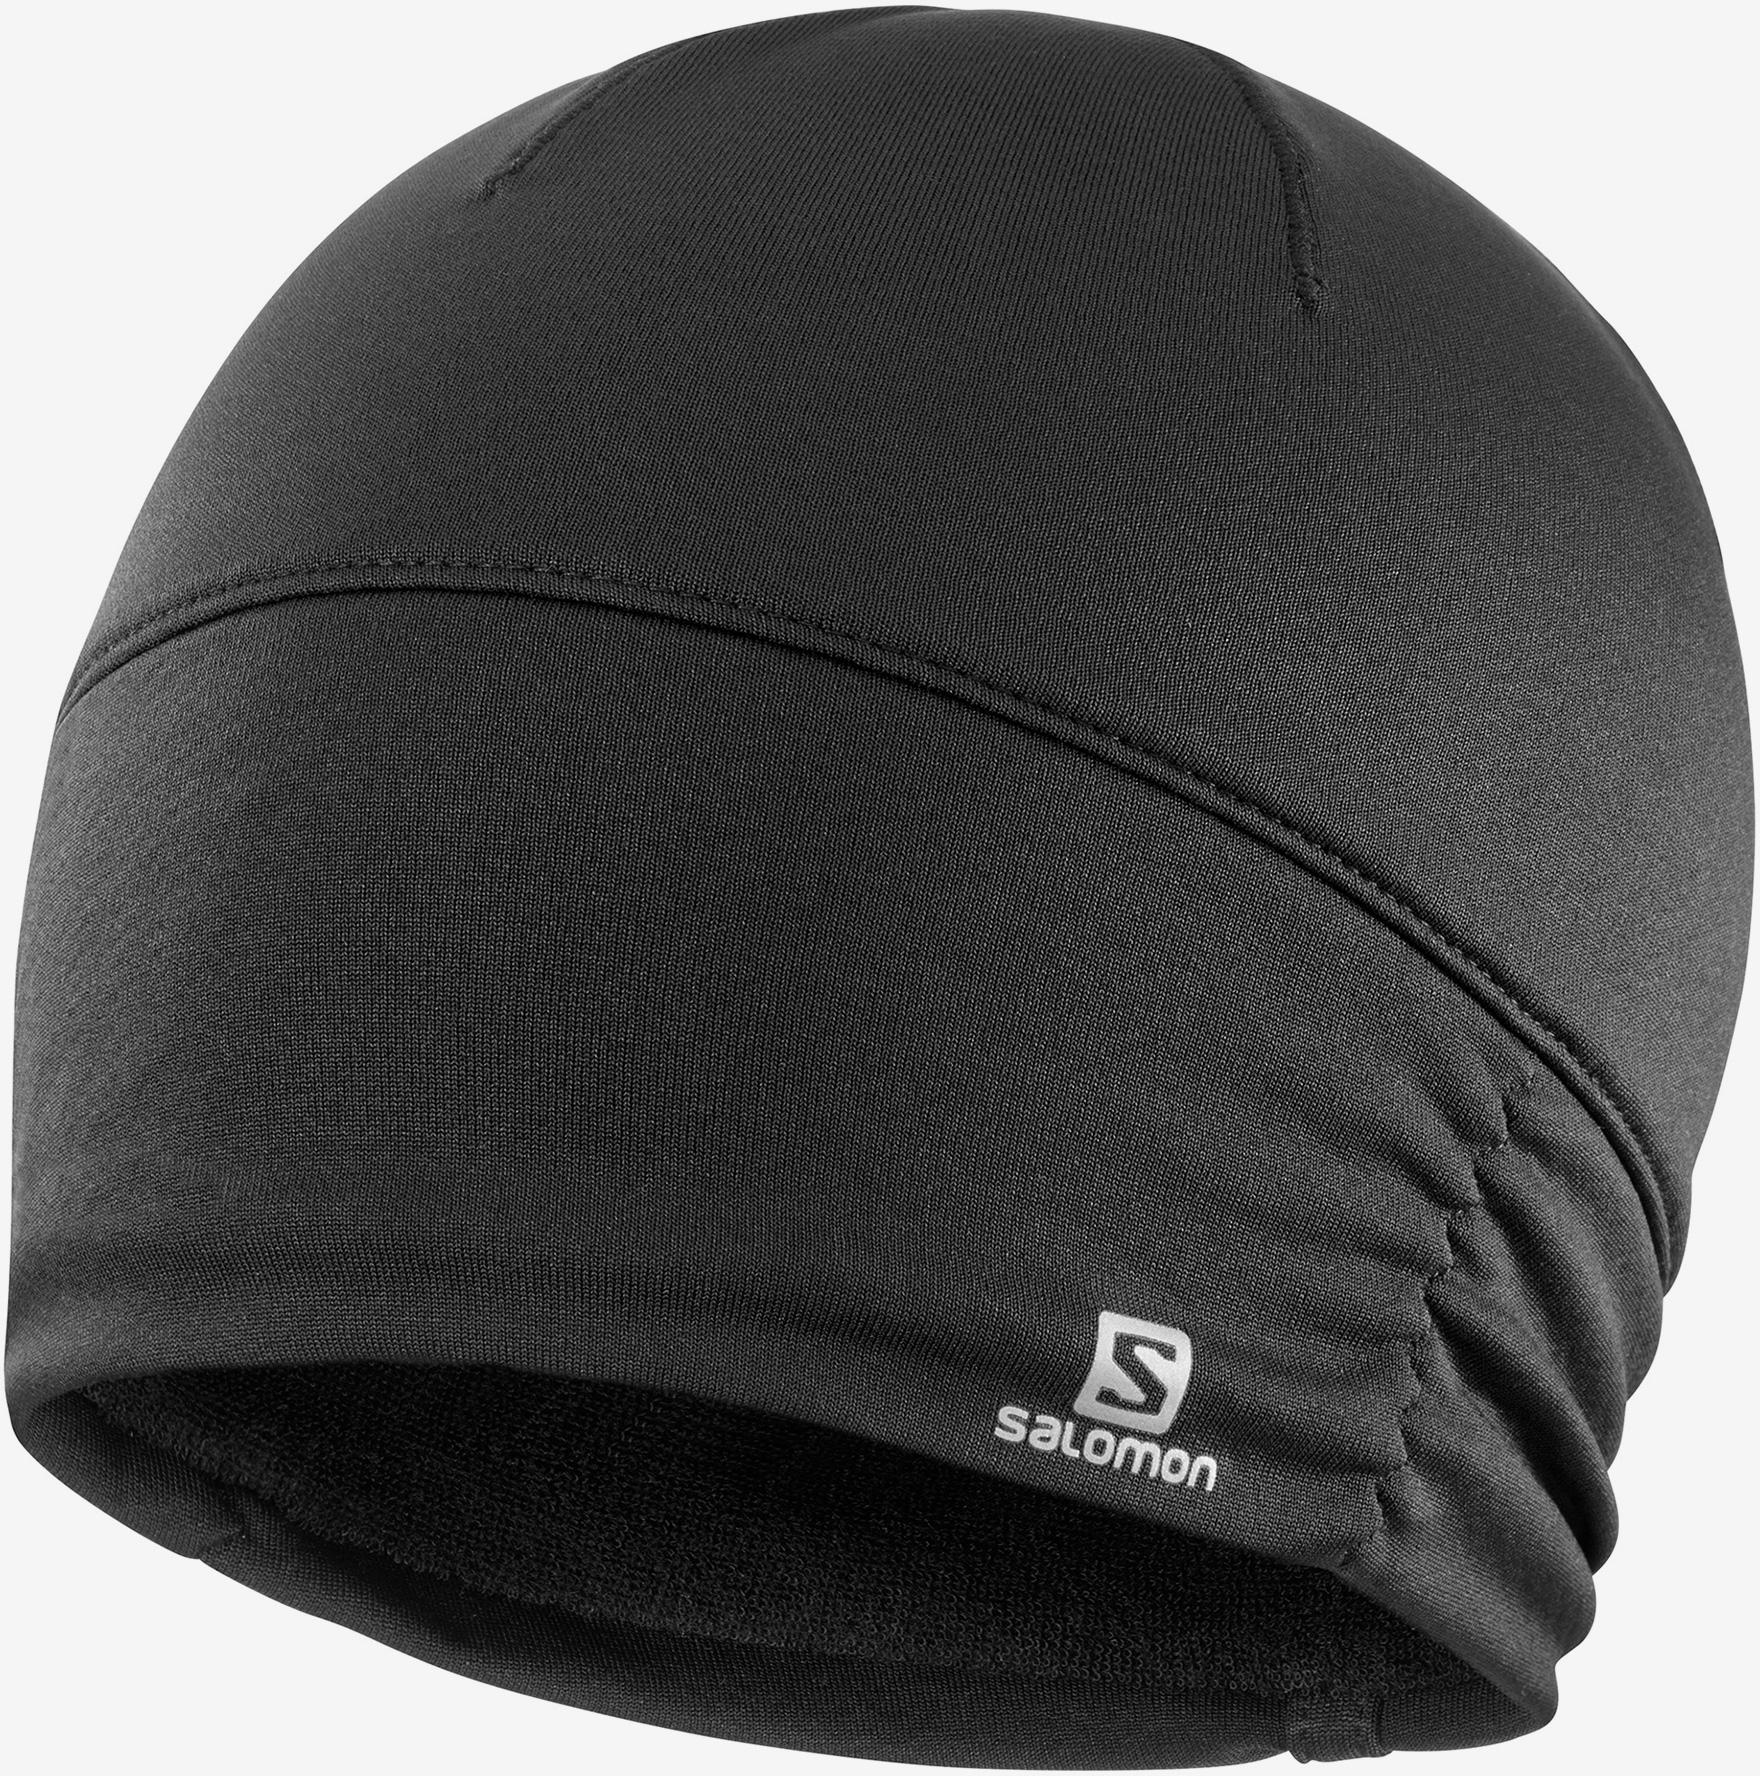 Спортивные шапки Шапка Salomon Elevate Warm Beanie W Black elevate-warm-beanie-w__LC1178900.jpg